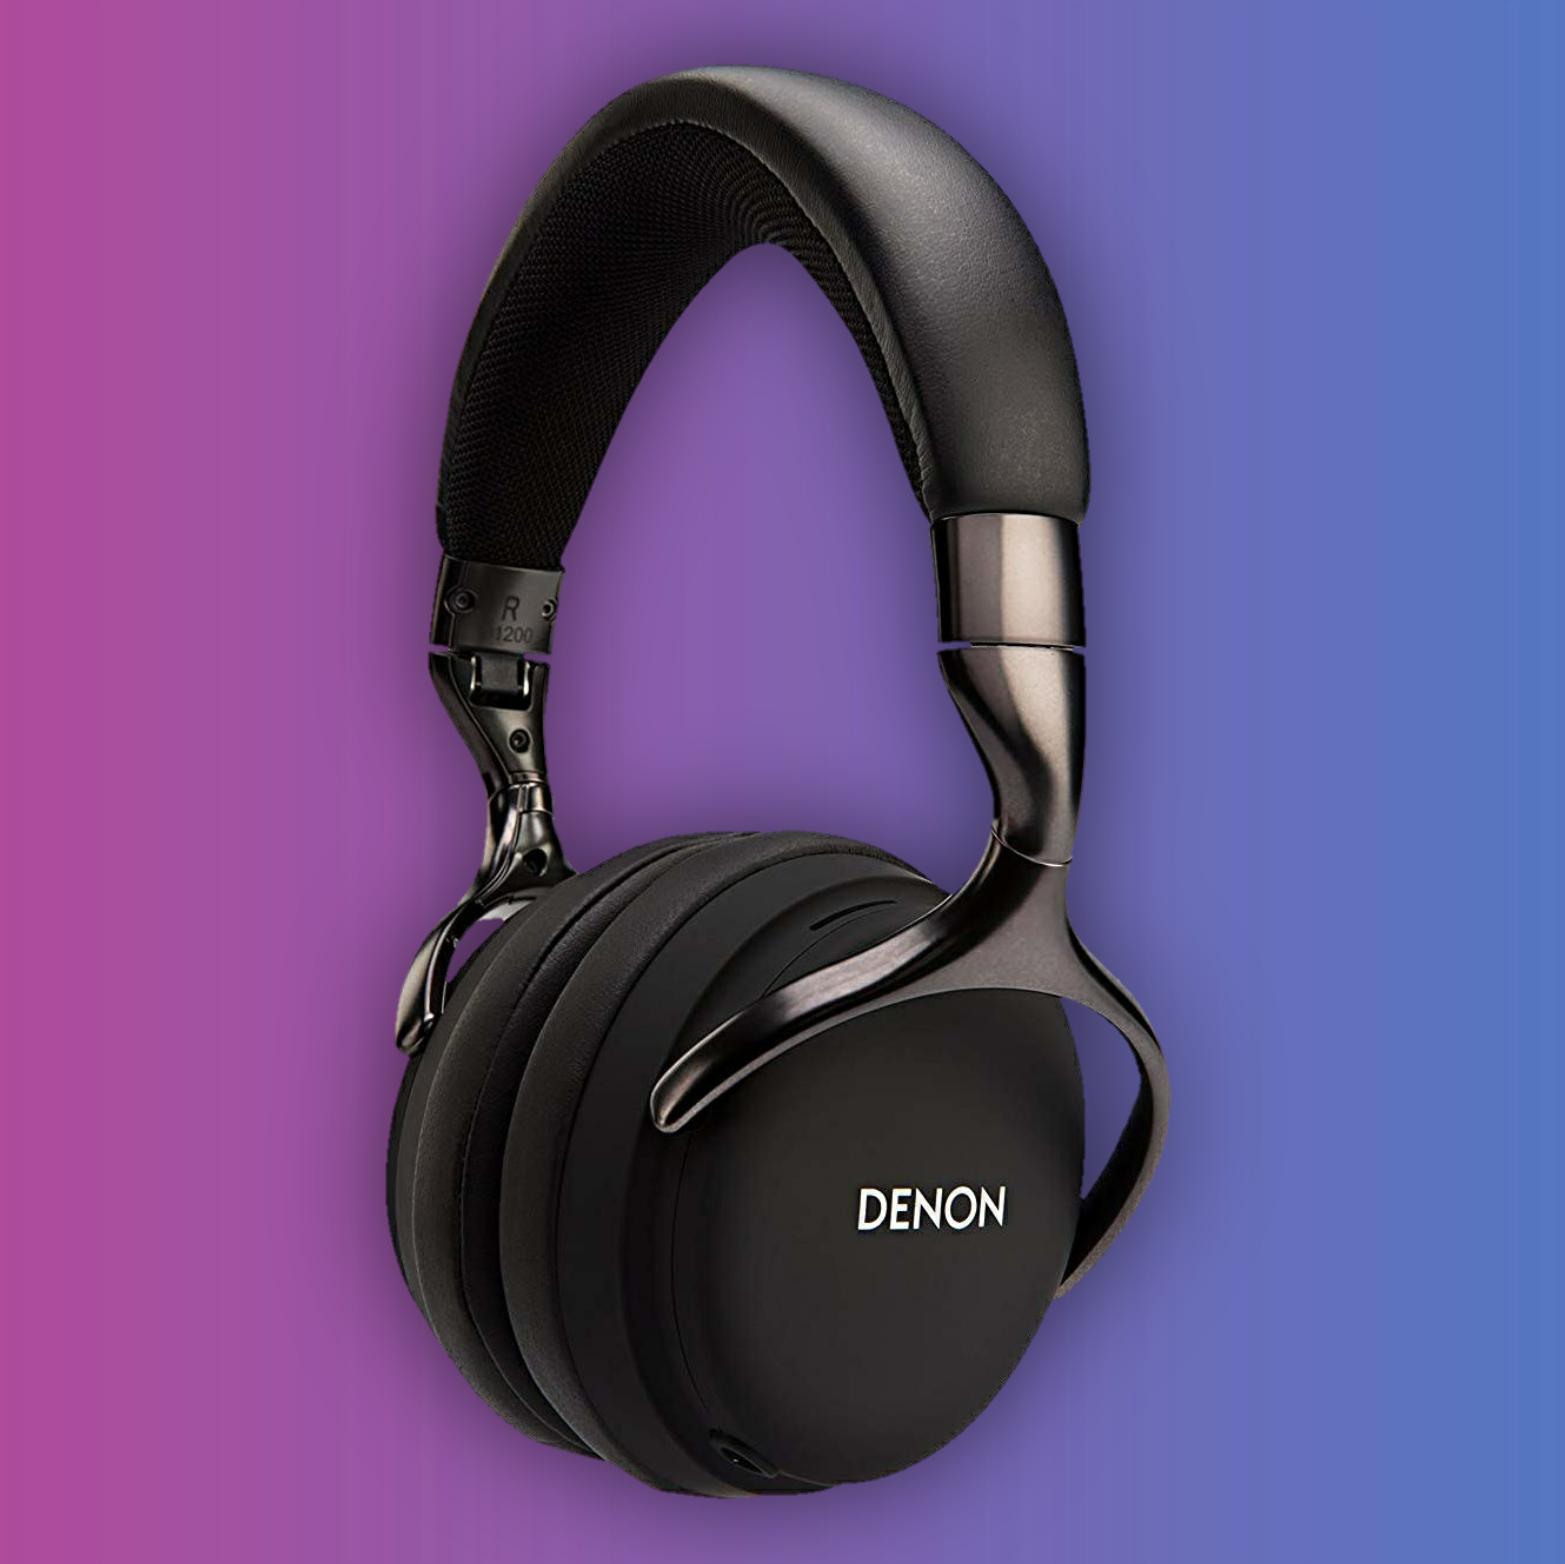 Denon AH-D1200: Geschlossener Over-Ear Kopfhörer (50mm Treiber, 5Hz - 40kHz, 24 Ohm, Mikrofon)